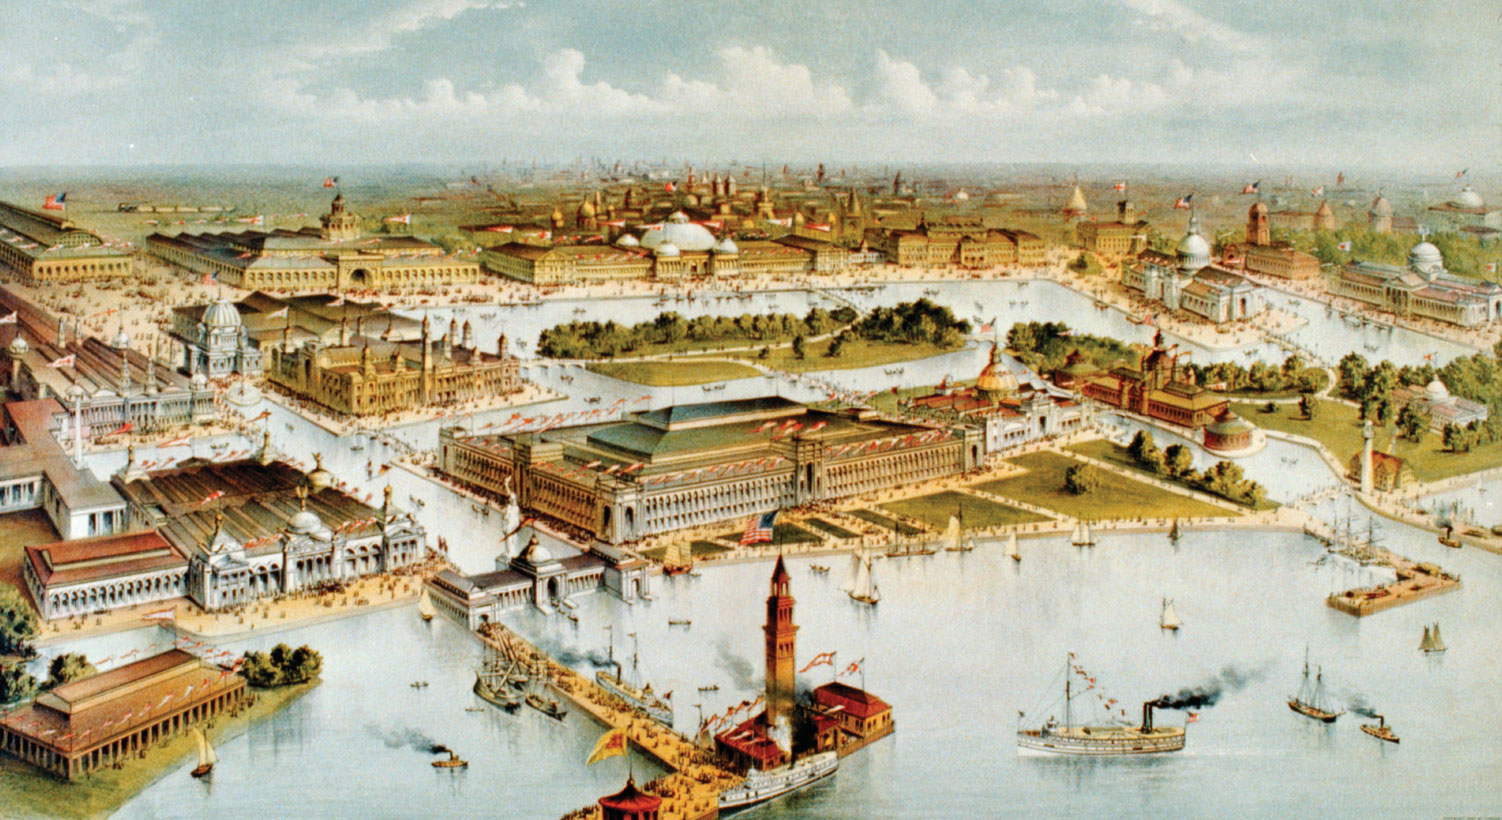 Panorama da feira mundial de Chicago de 1893